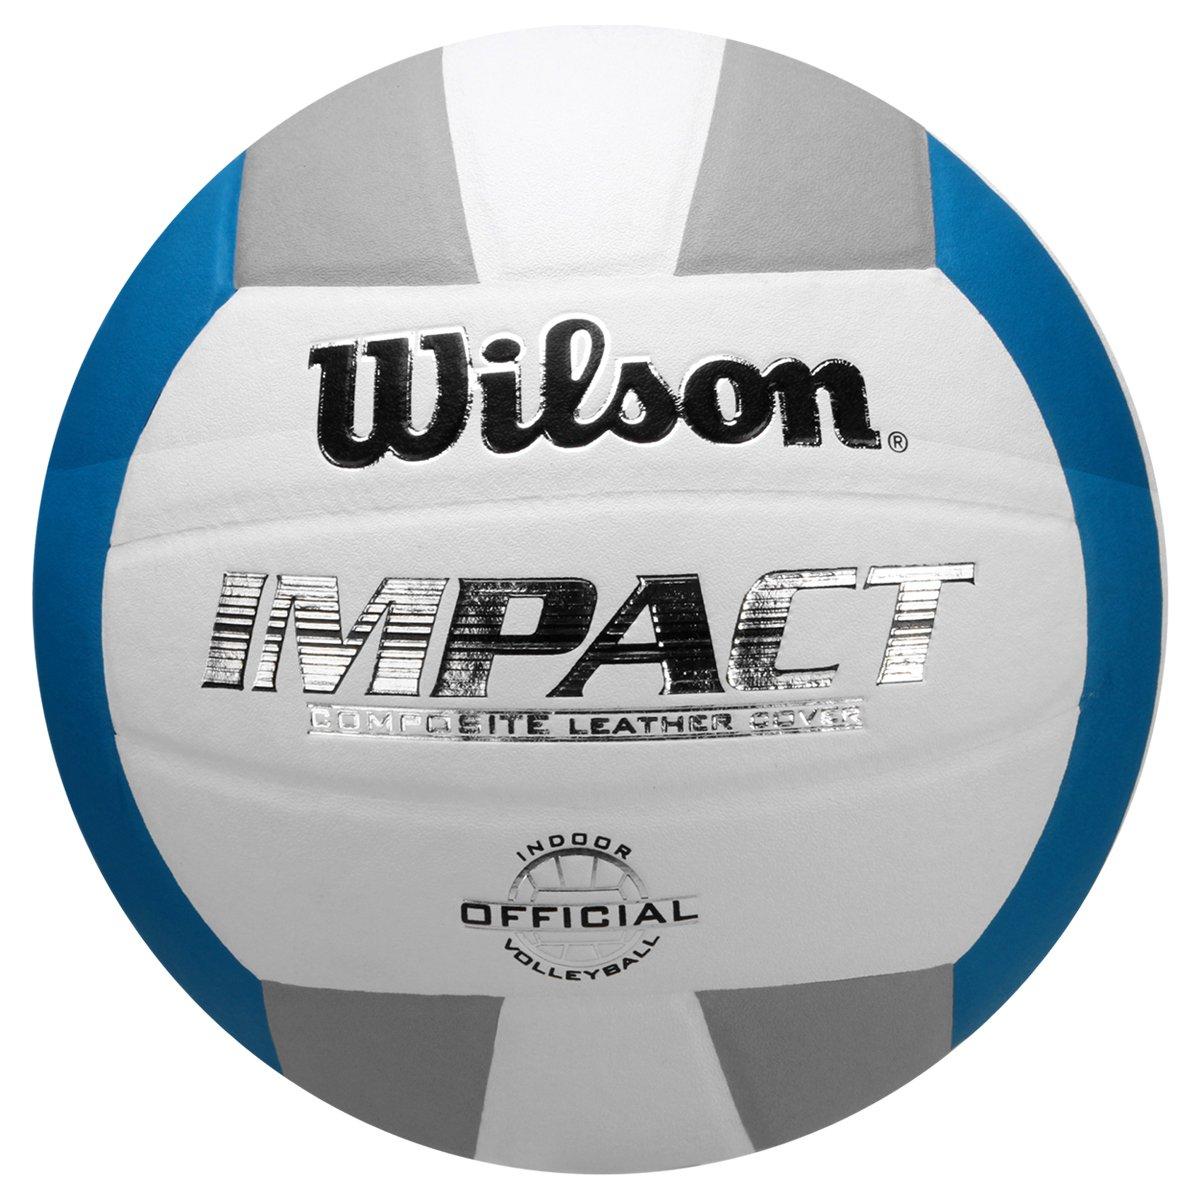 bf93794f3 Bola de vôlei wilson impact branco e azul compre agora netshoes jpg 544x544  Bola de volei